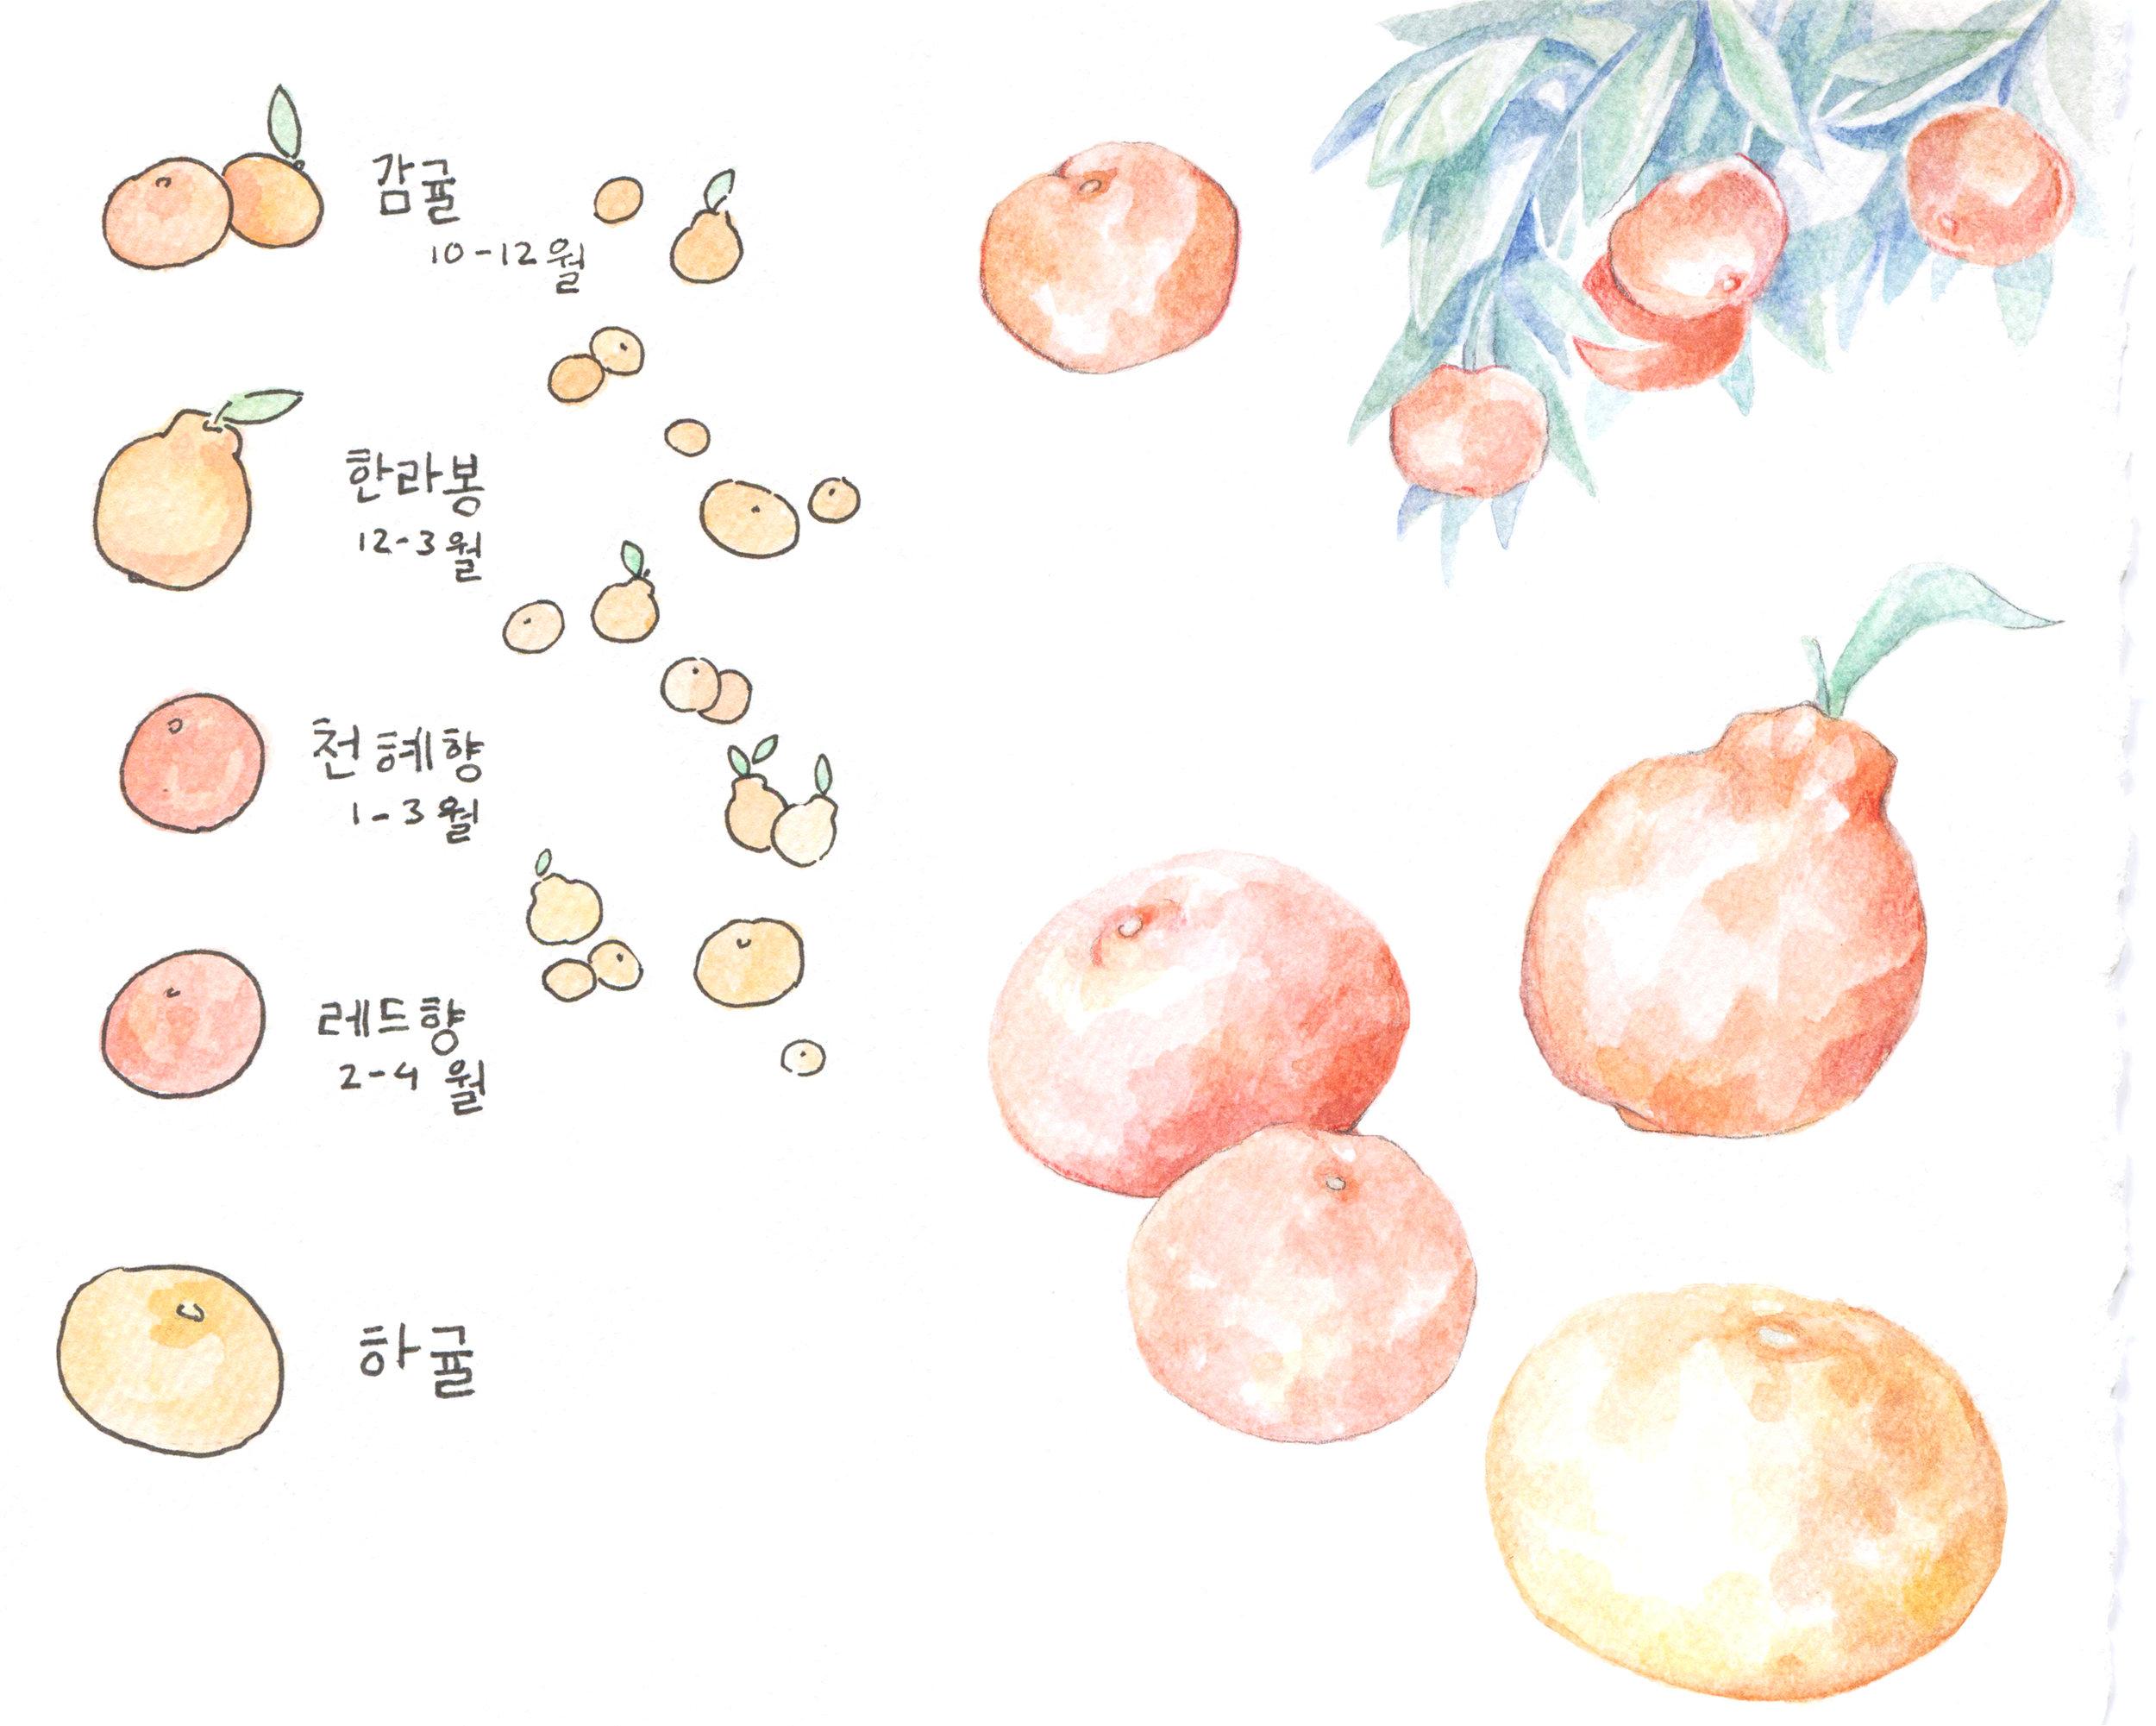 Jeju Island mandarins illustration, from top to bottom: Gamgyul (Oct-Dec), Hallabong (Dec-Mar), Cheonhyehyang (Jan-Mar), Redhyang (Feb-Apr), Hagyul (late spring)